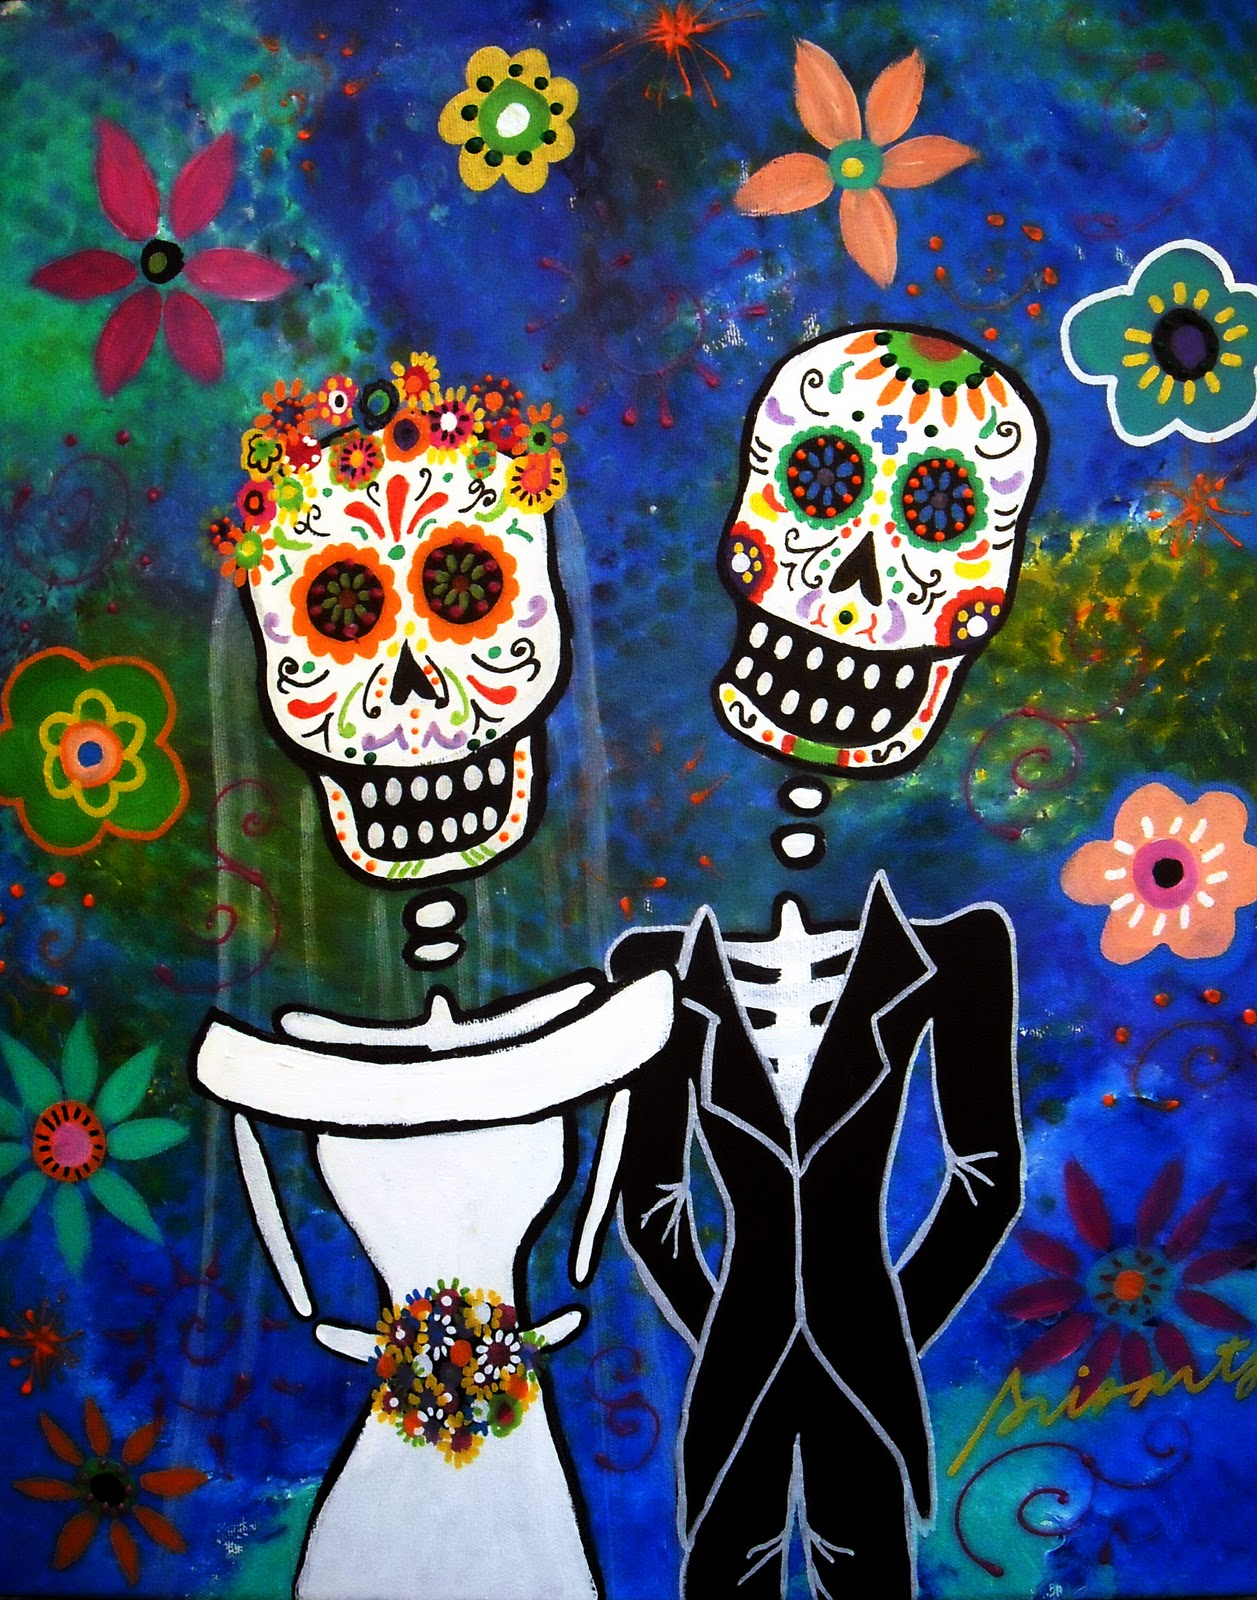 MEXICAN FOLK ART ORIGINAL PAINTINGS BY PRISTINE CARTERA TURKUS